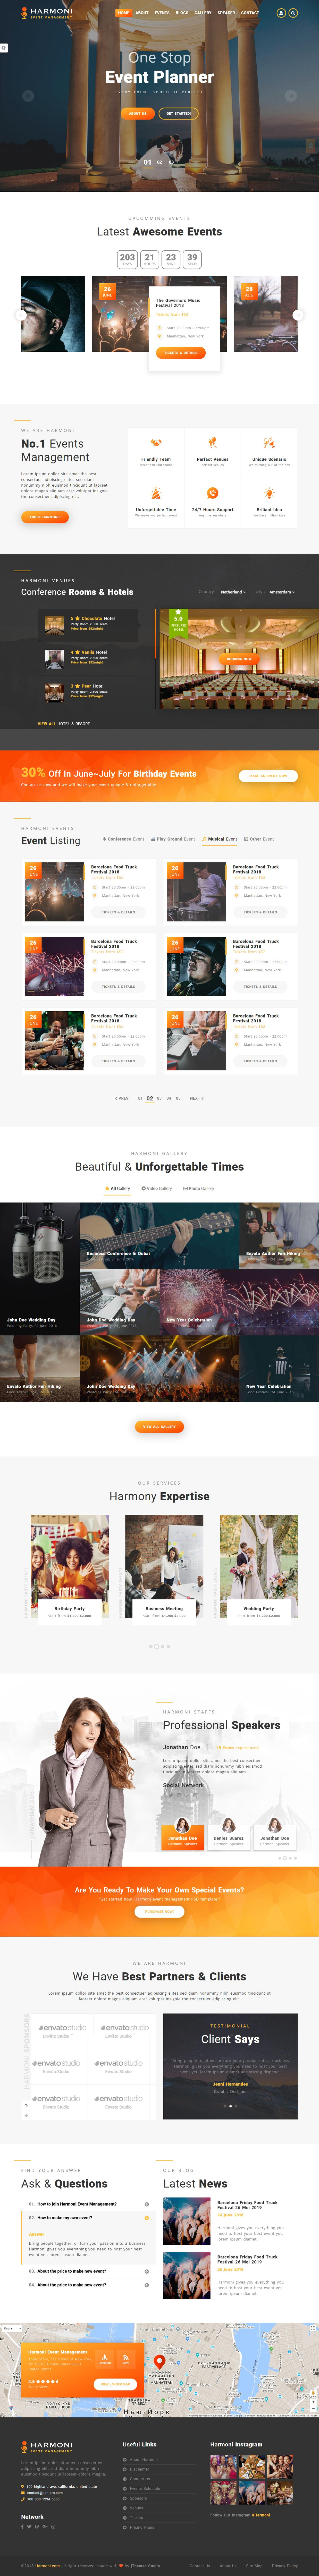 Harmoni - Event Management HTML Template   Pinterest   Event ...